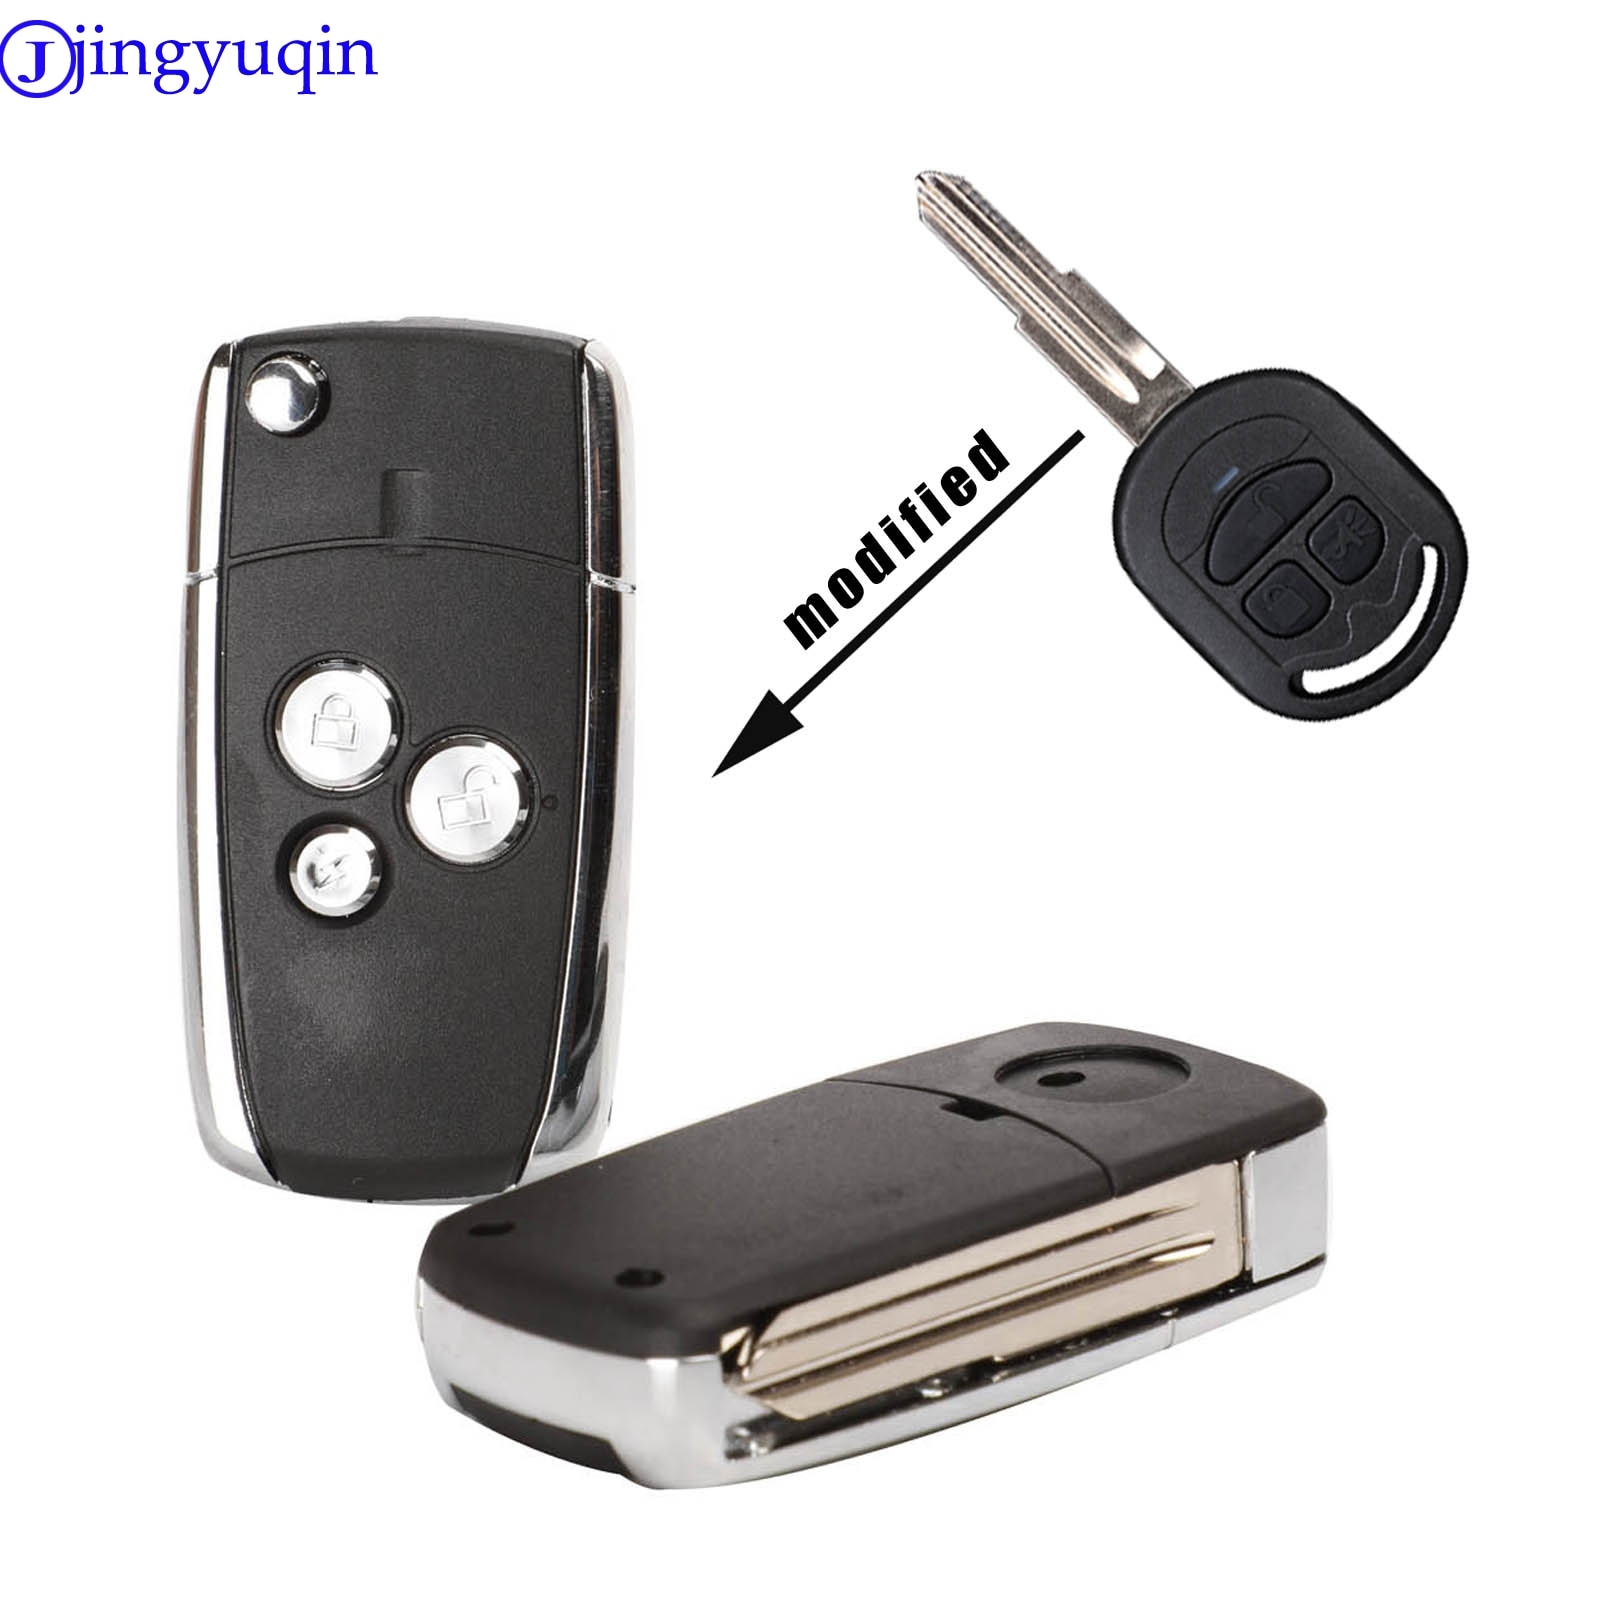 Jingyuqin Neue Änderung 3 Taste Flip Folding Remote Key Blank Fall Auto Schlüssel Shell Fit Für Buick Excelle HRV Schlüssel shell